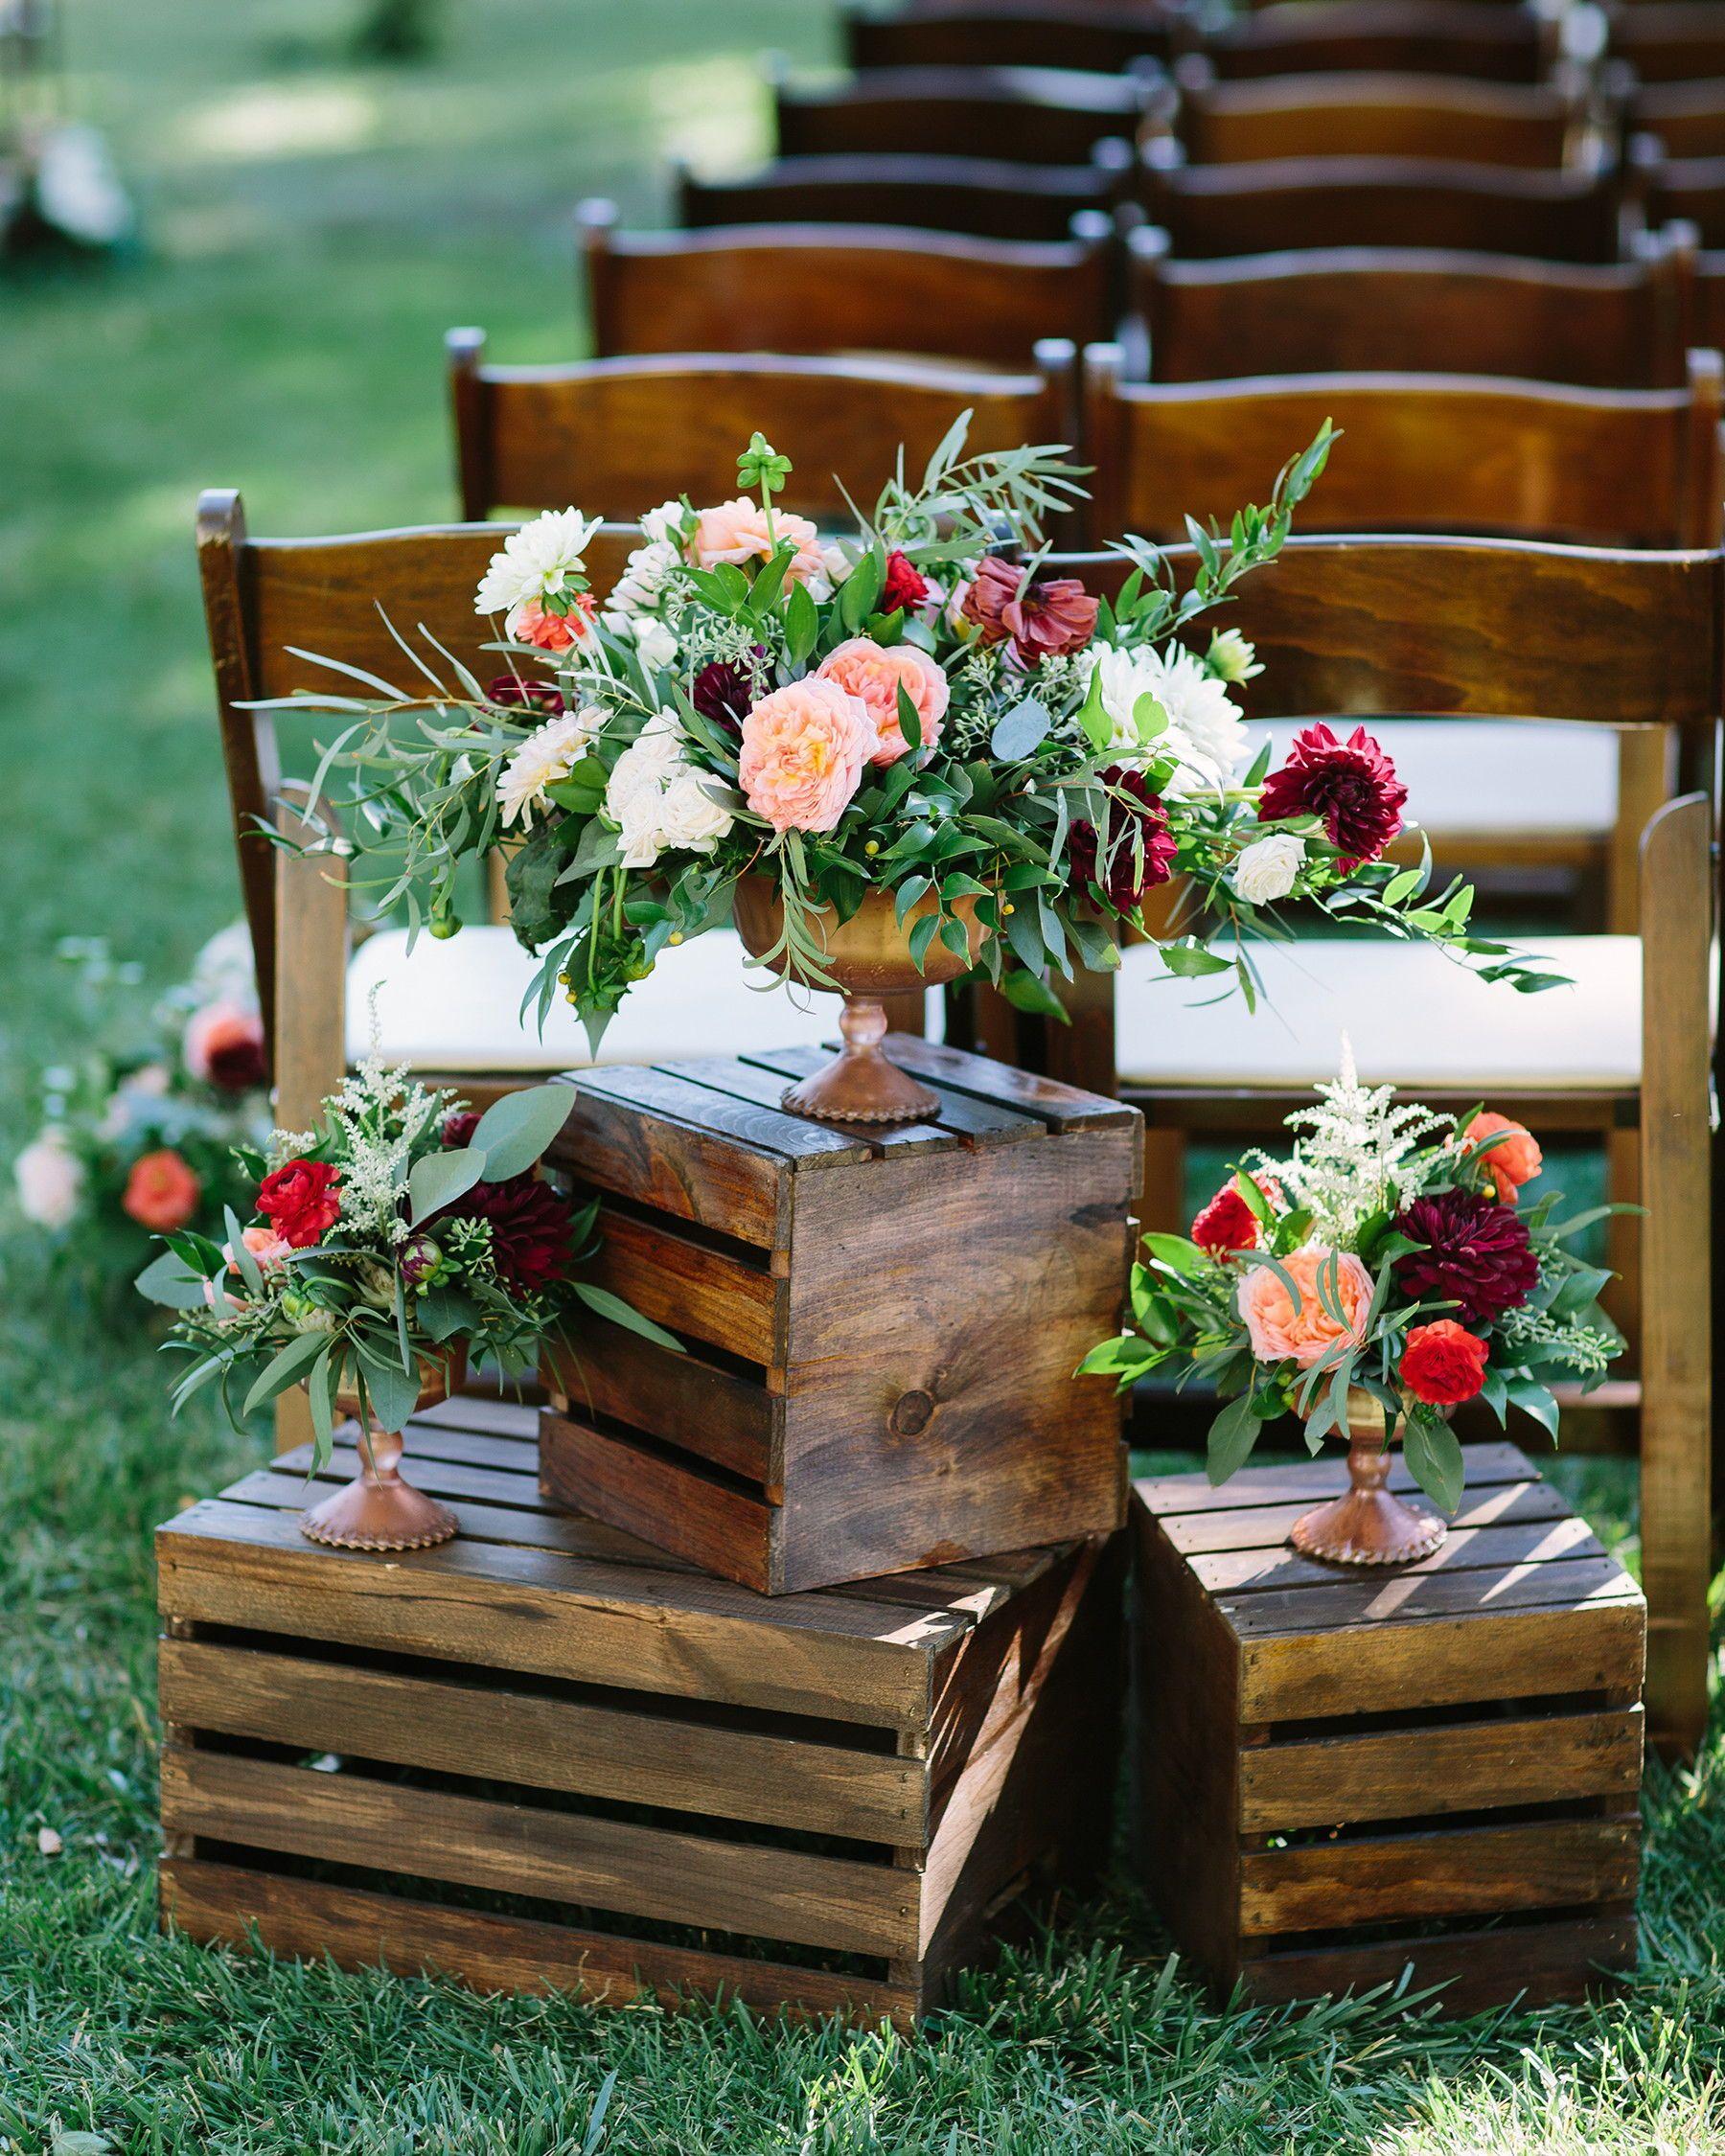 Rustic Wedding Altar Ideas: 35 Altar And Aisle Decorations We Love